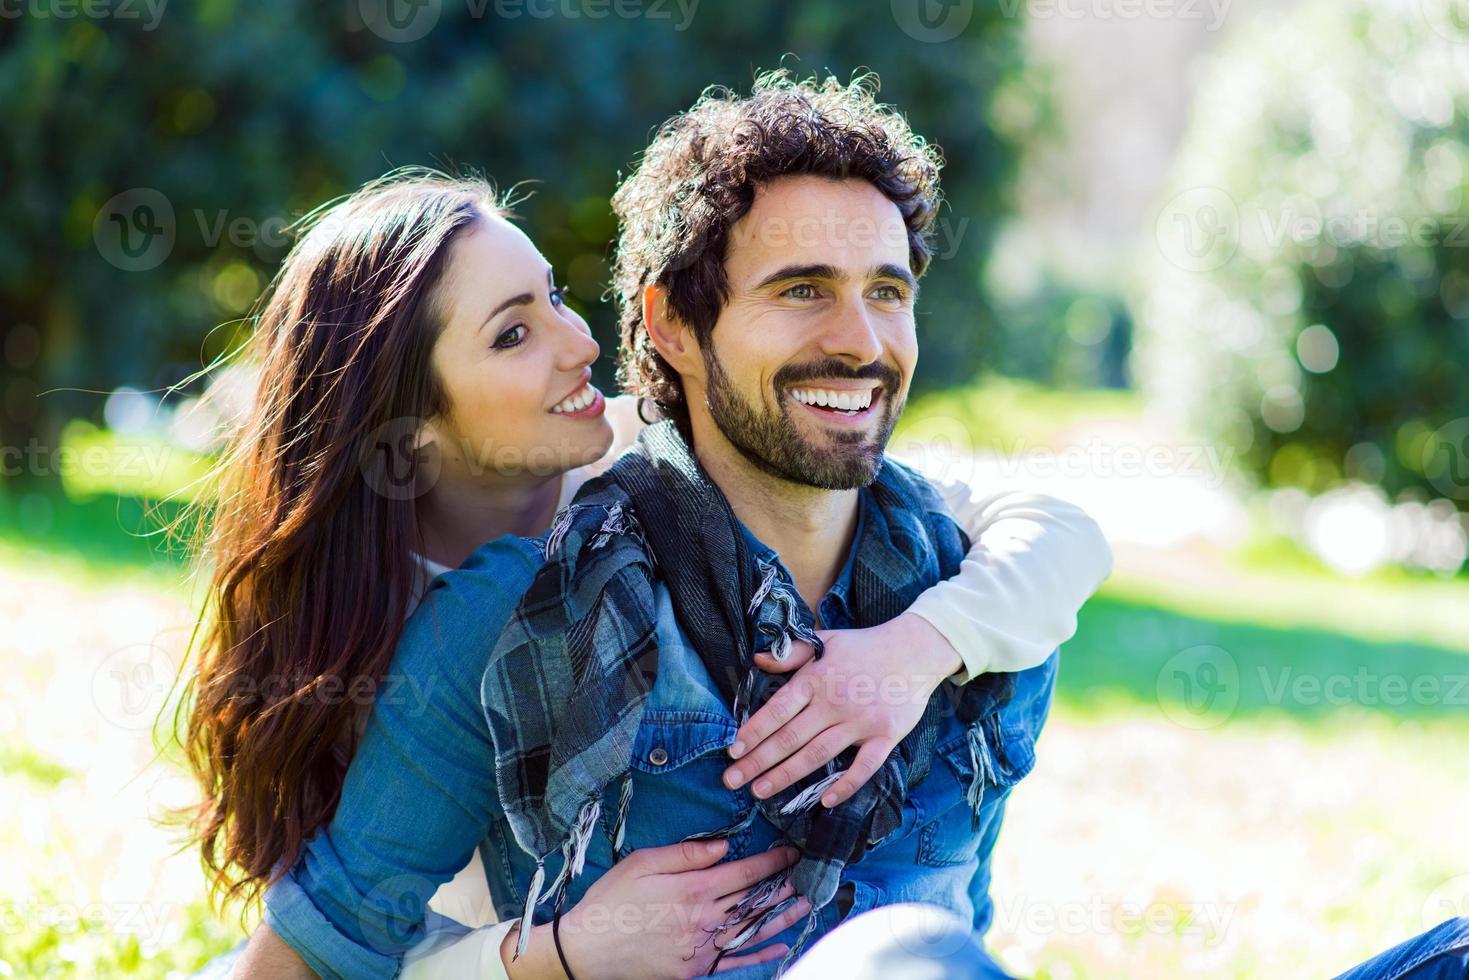 pareja divirtiéndose al aire libre foto